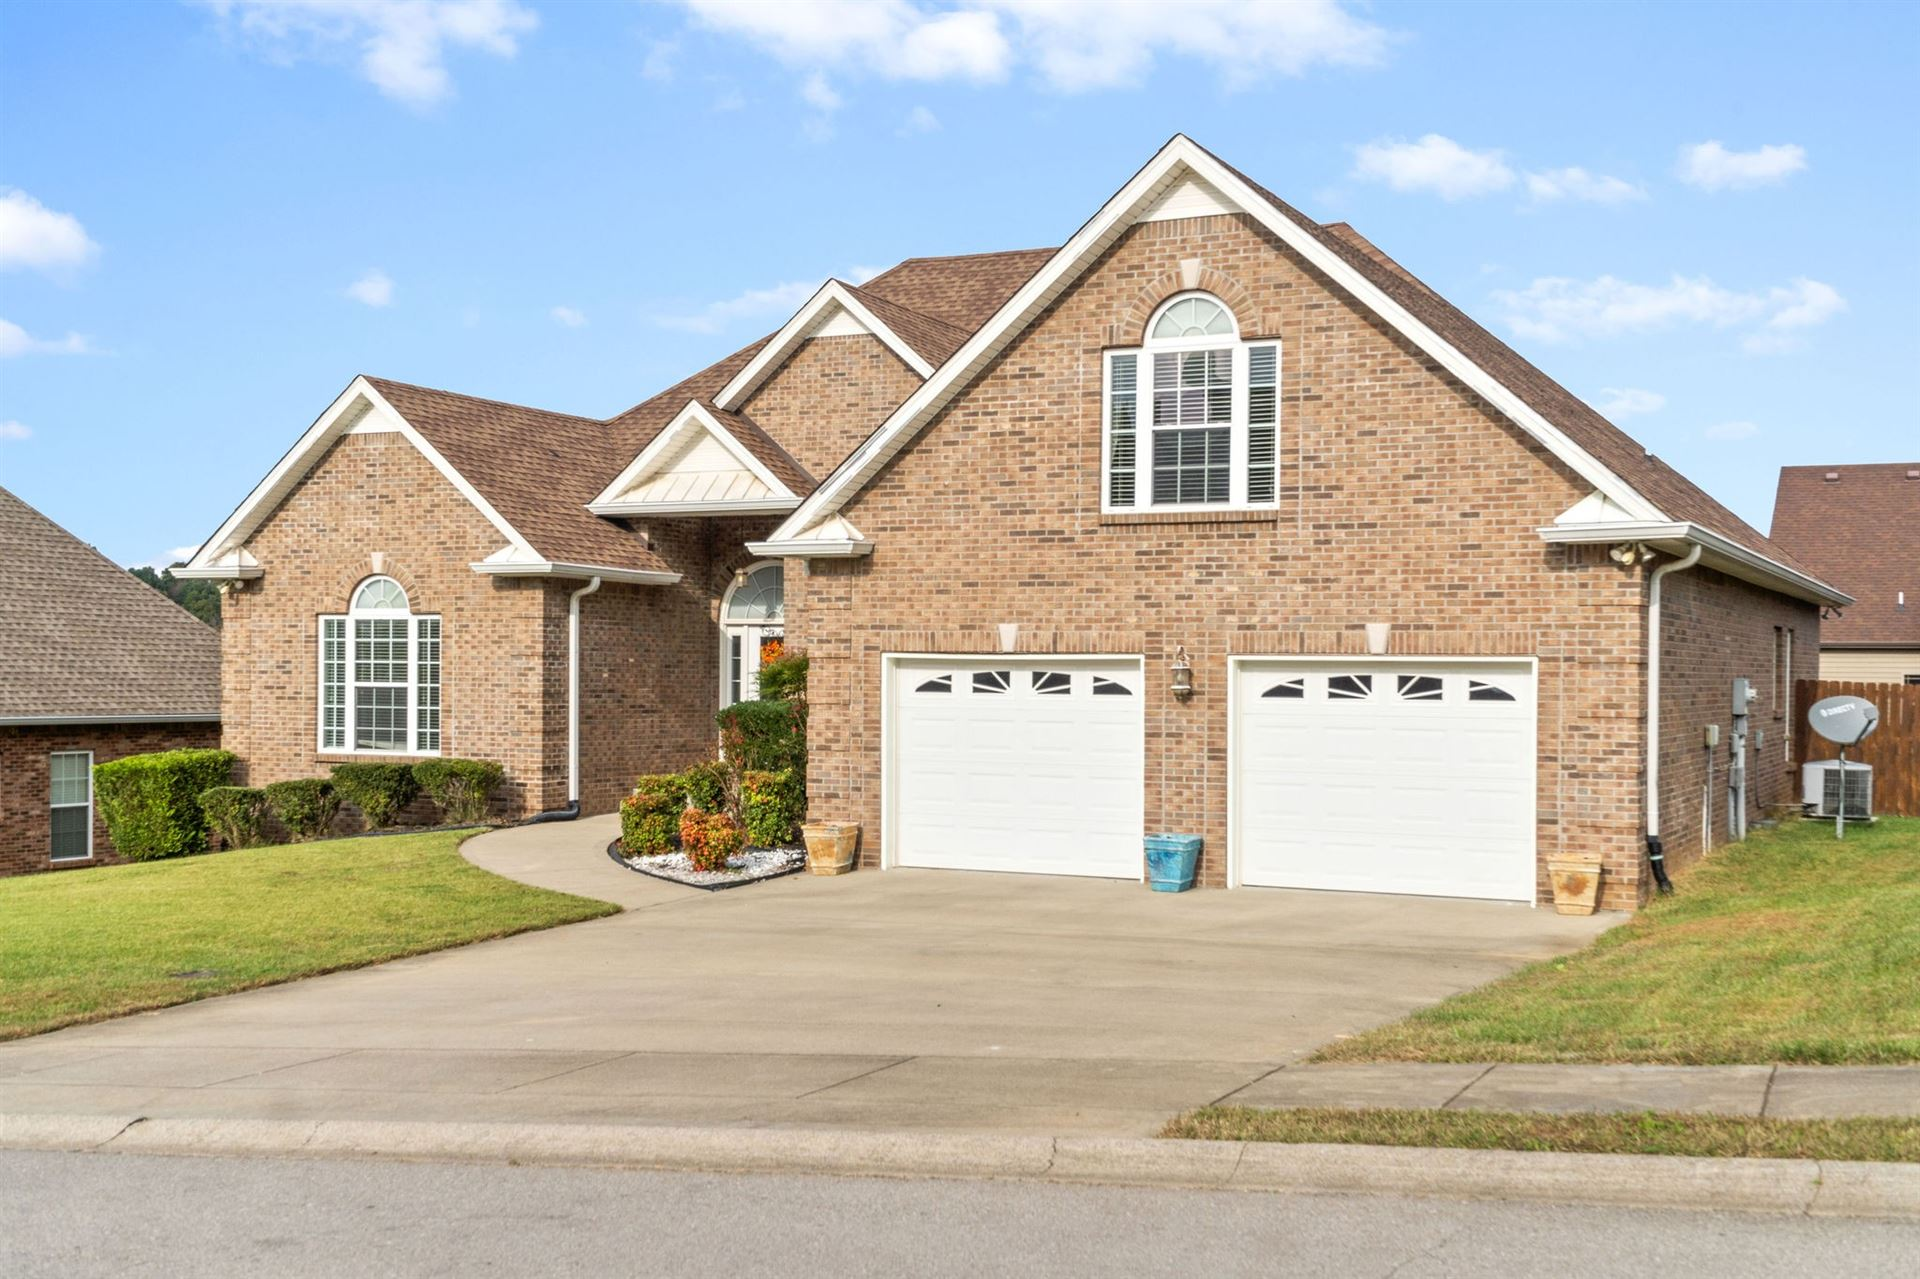 Photo of 225 Spring Terrace Ln, Clarksville, TN 37040 (MLS # 2302922)